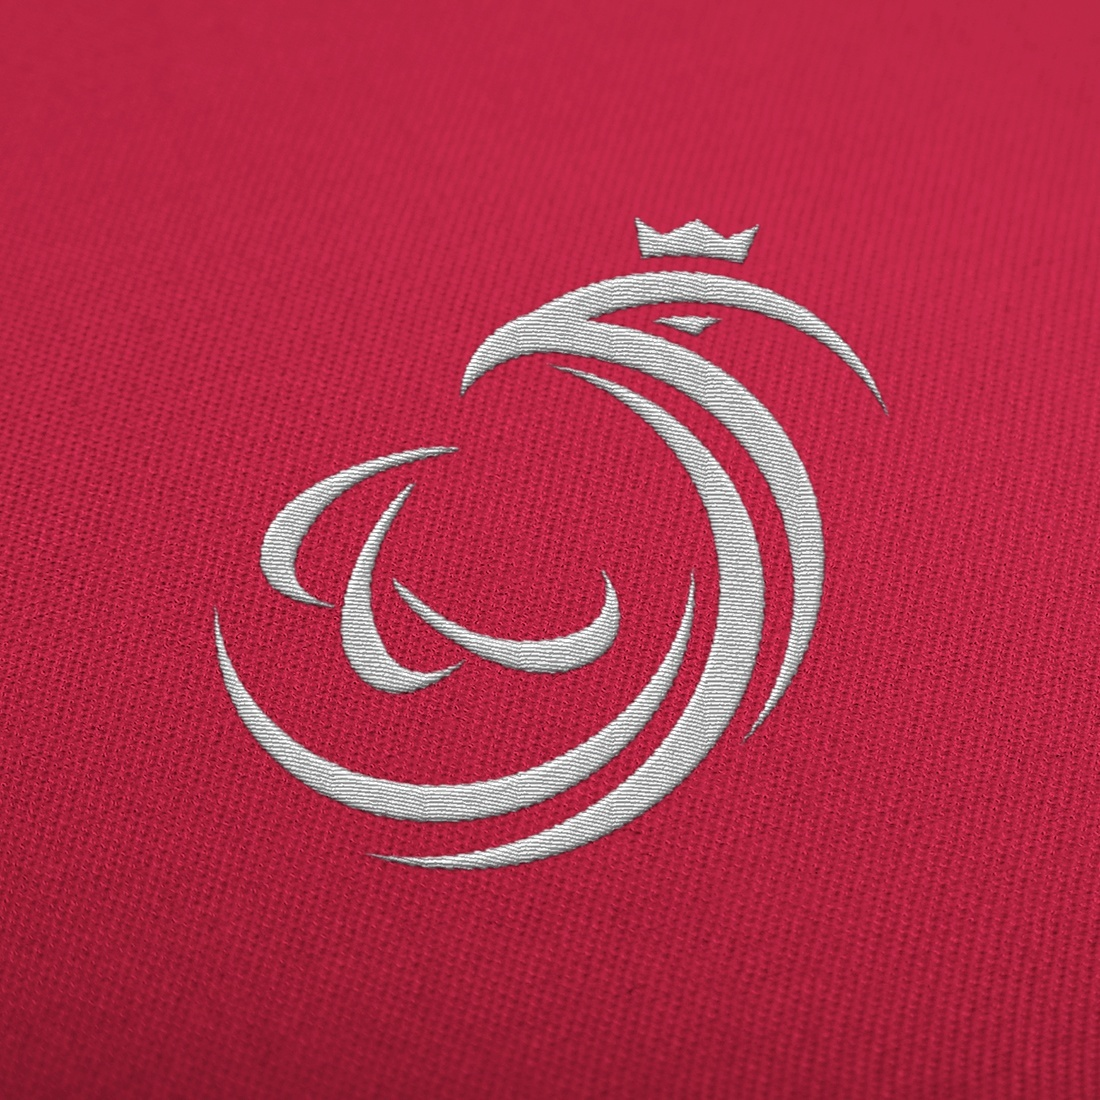 Polski Komitet Paraolimpijski logo